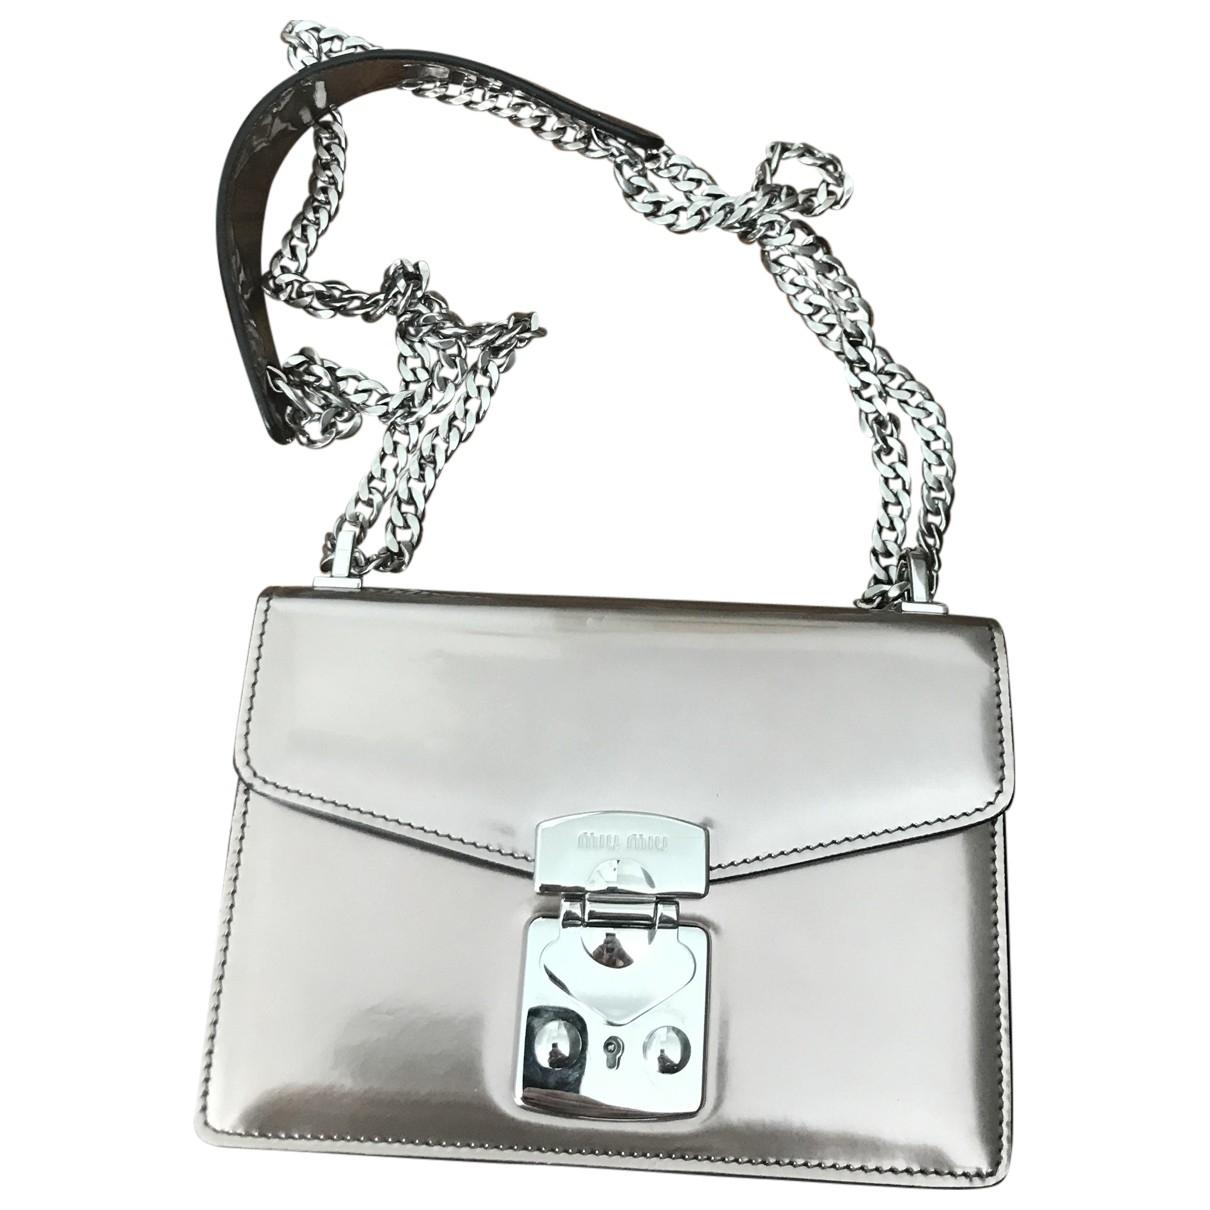 Miu Miu \N Metallic Patent leather handbag for Women \N